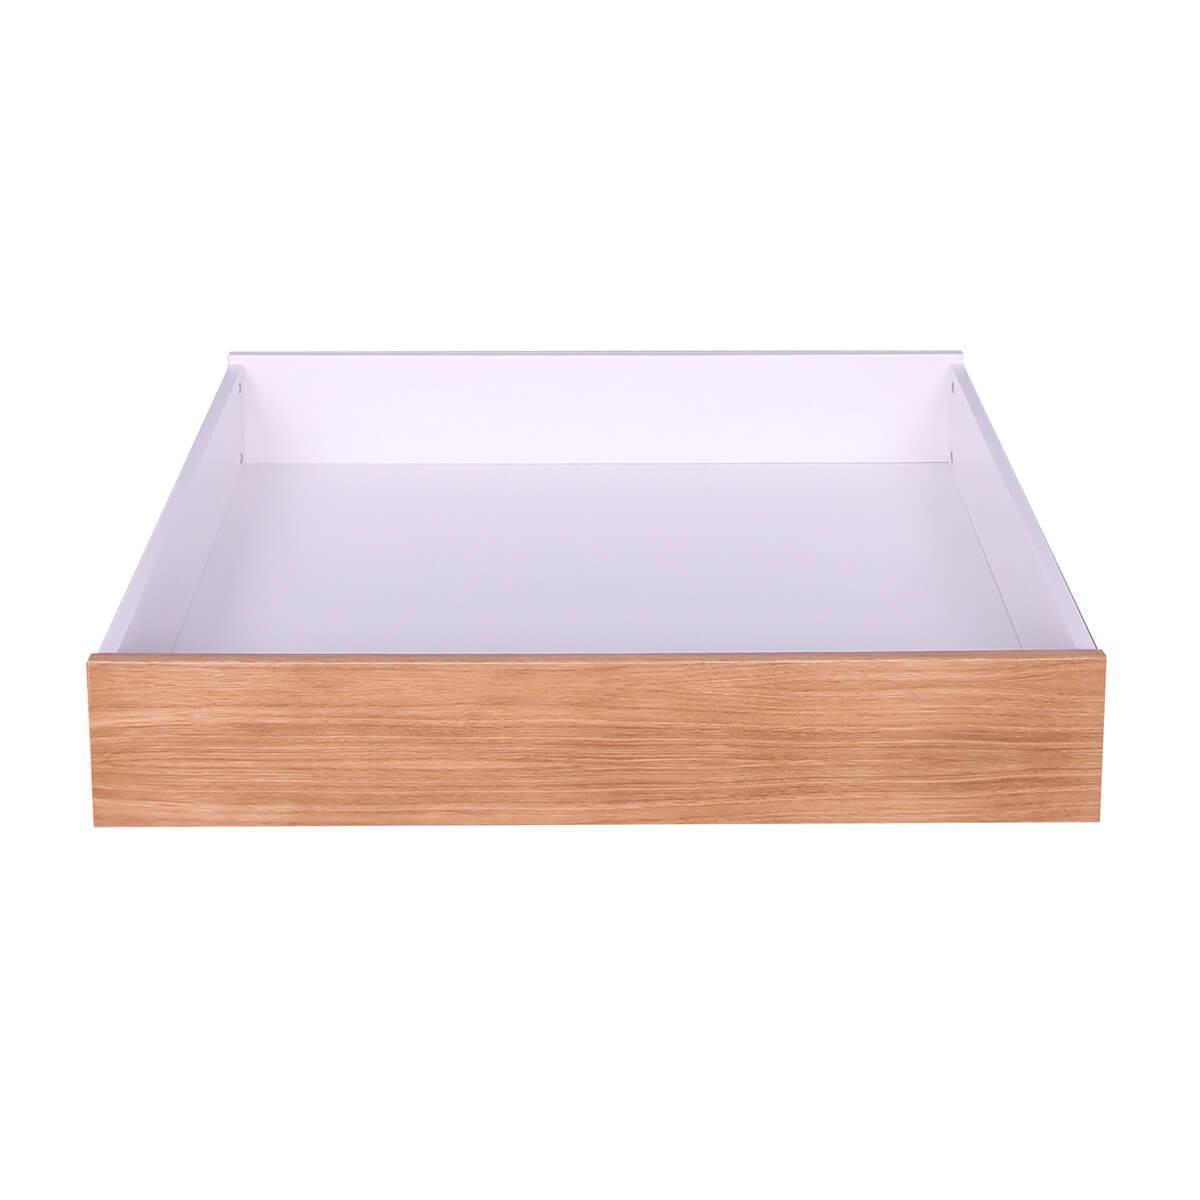 Tiroir lit KASVA Mdf blanc lacqué-Multiplex chêne plaqué